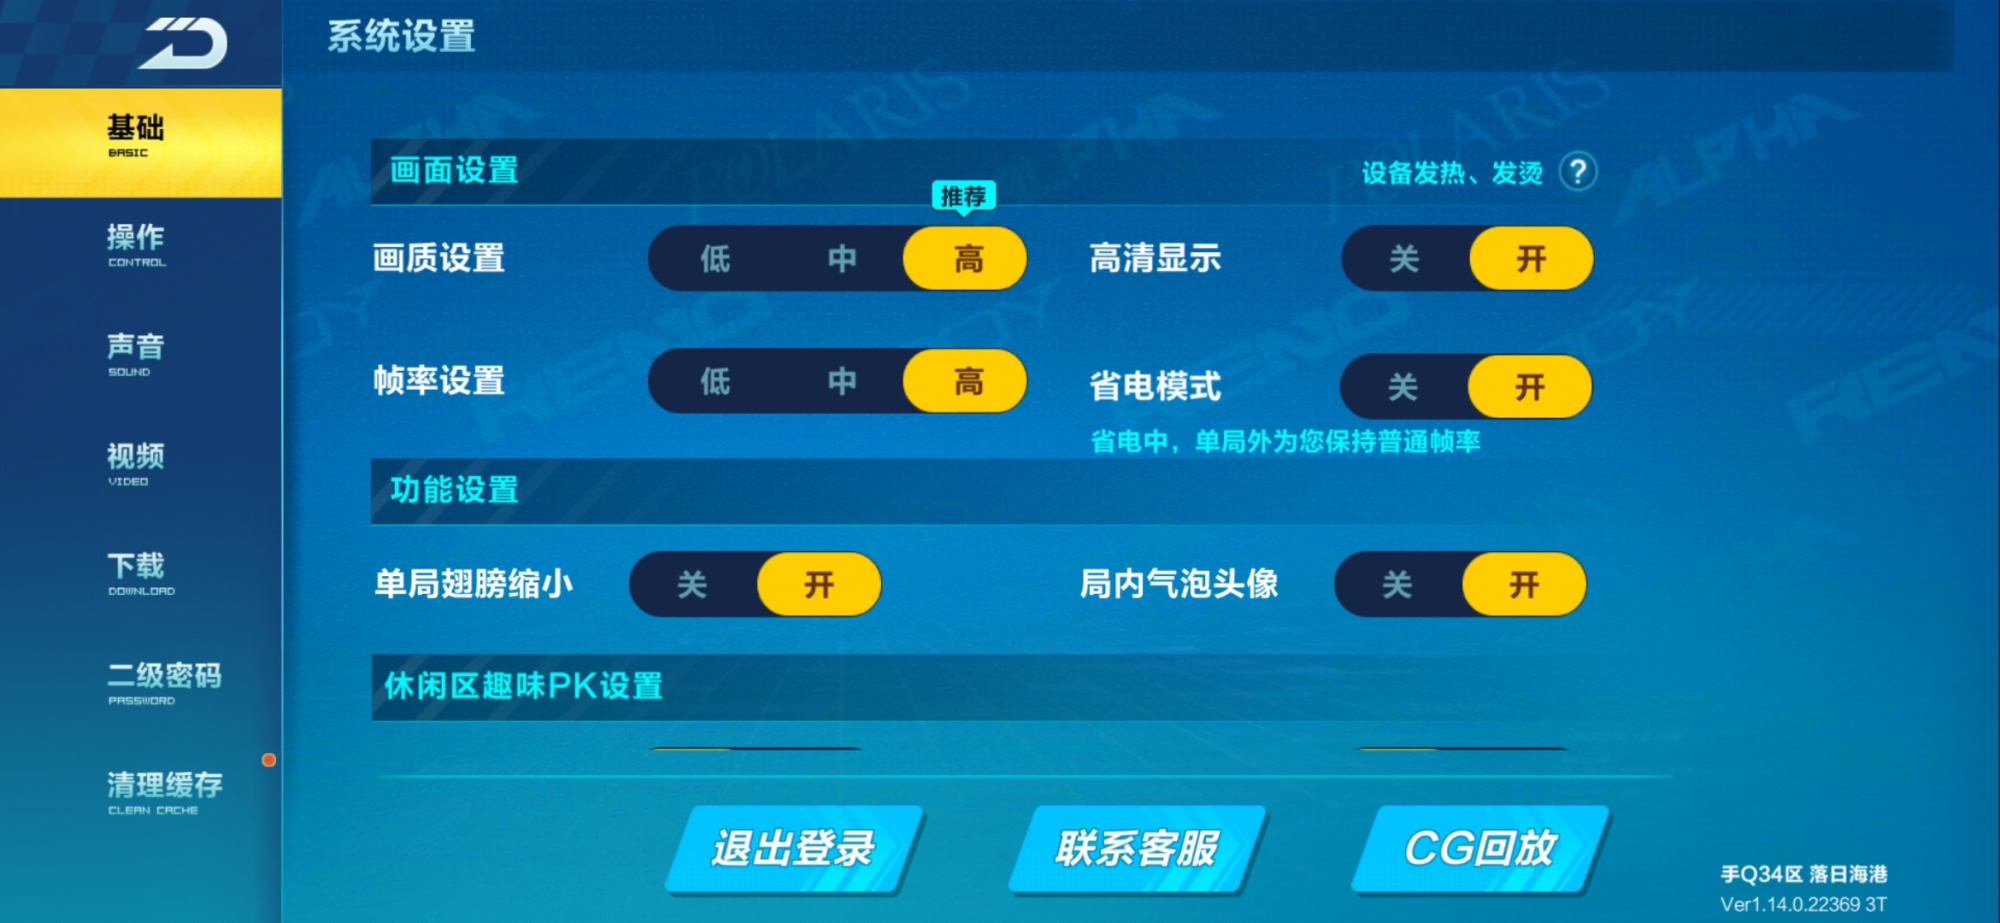 Screenshot_20190715_161245_com.tencent.tmgp.speed.jpg